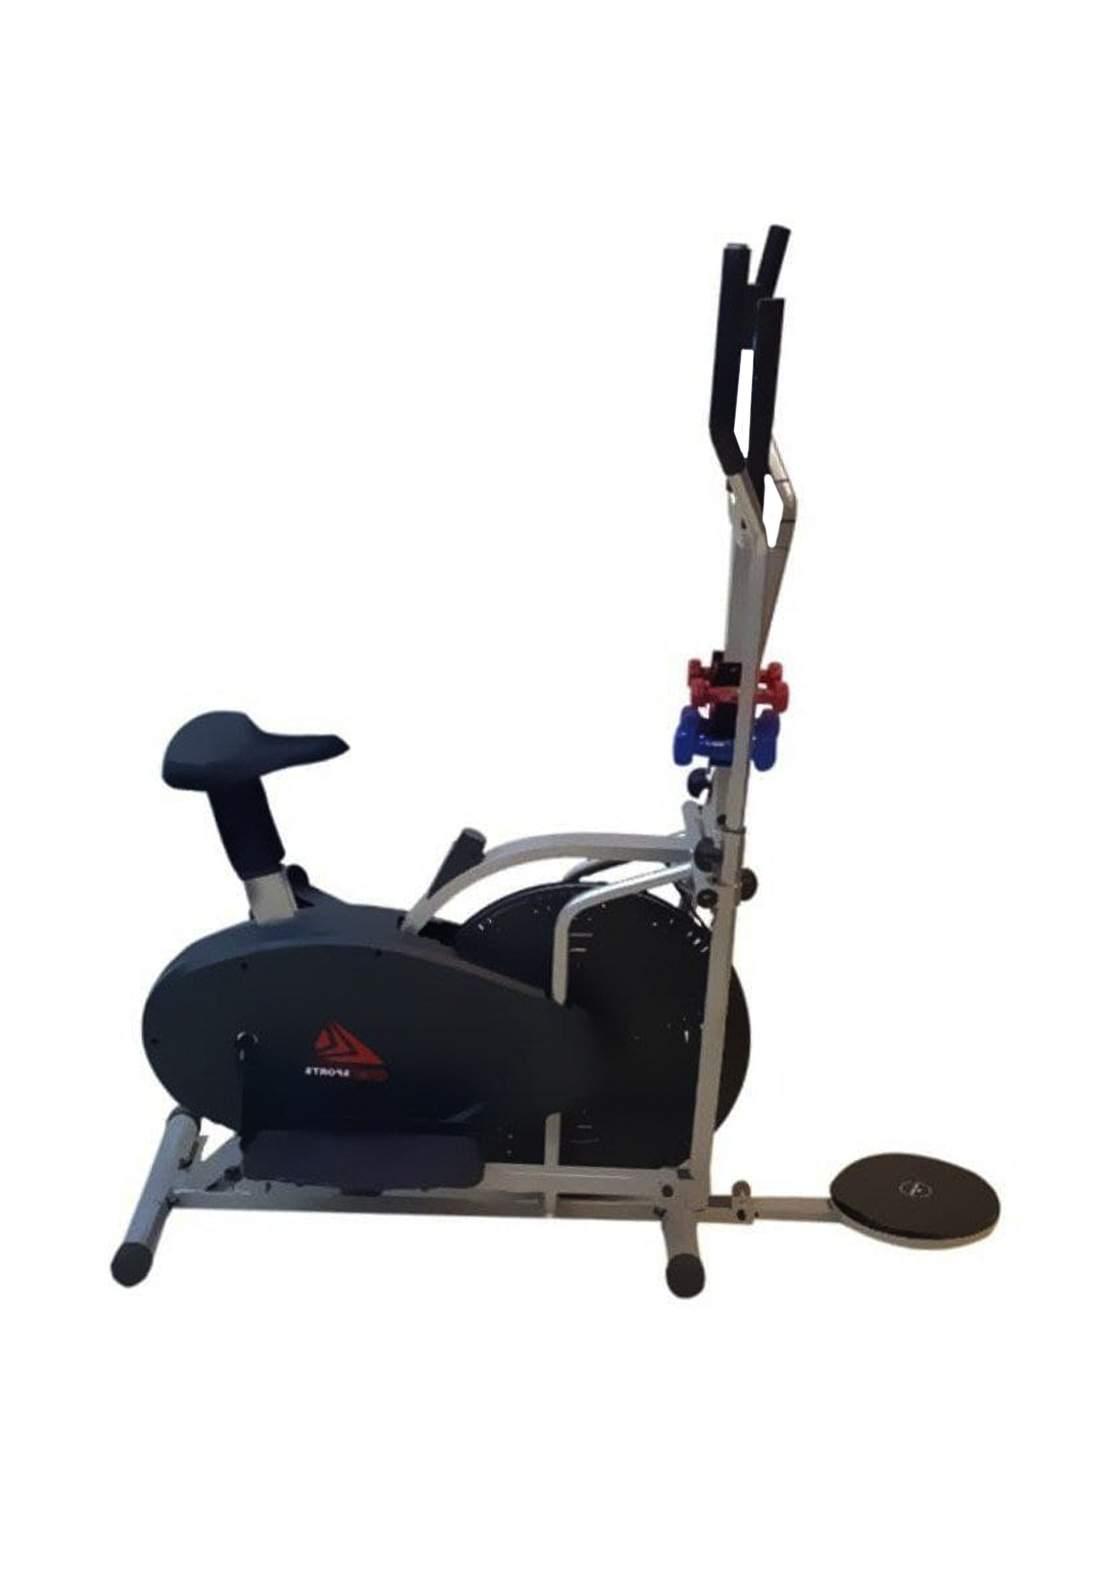 Orbitrac Exercise Bike For Weight Loss جهاز التمارين الرياضية